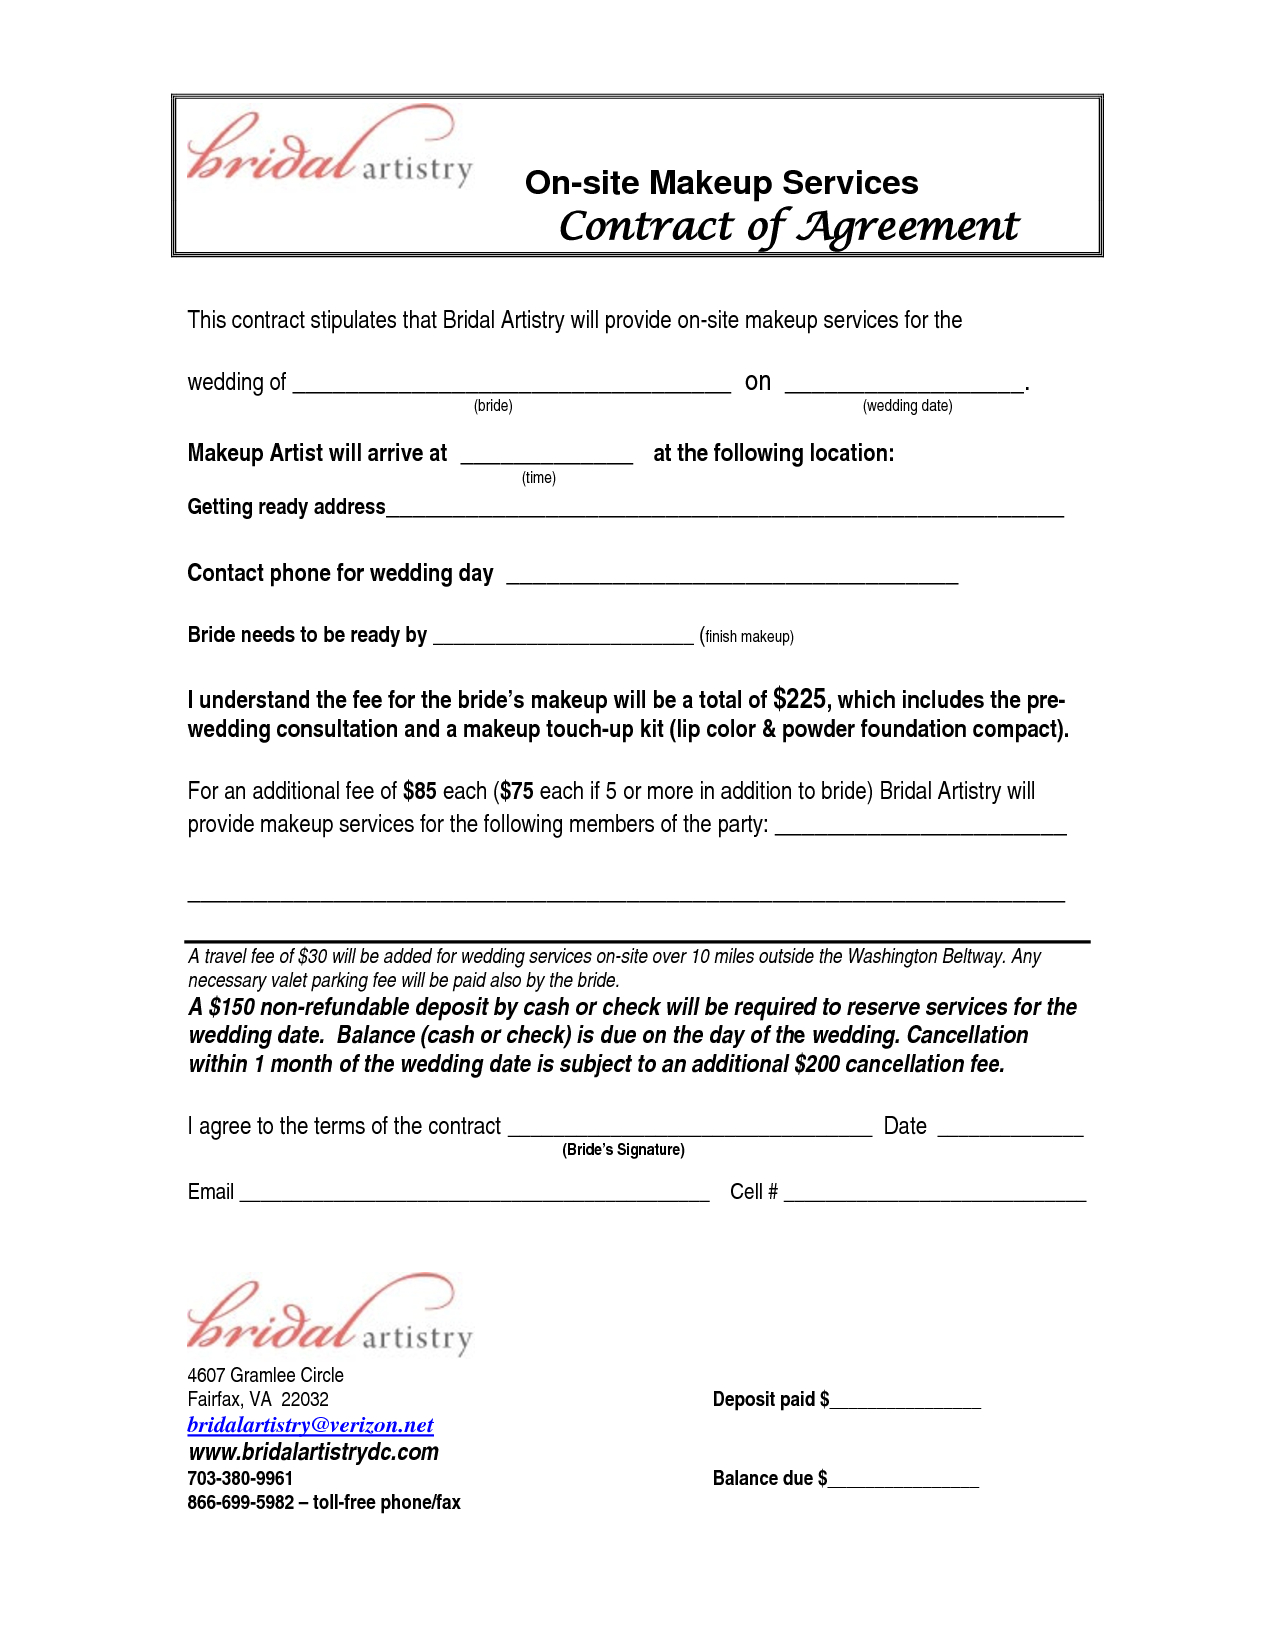 Site Makeup Services Contract Agreement   Makeup Artist Inside Free Makeup Wedding Contract Templates